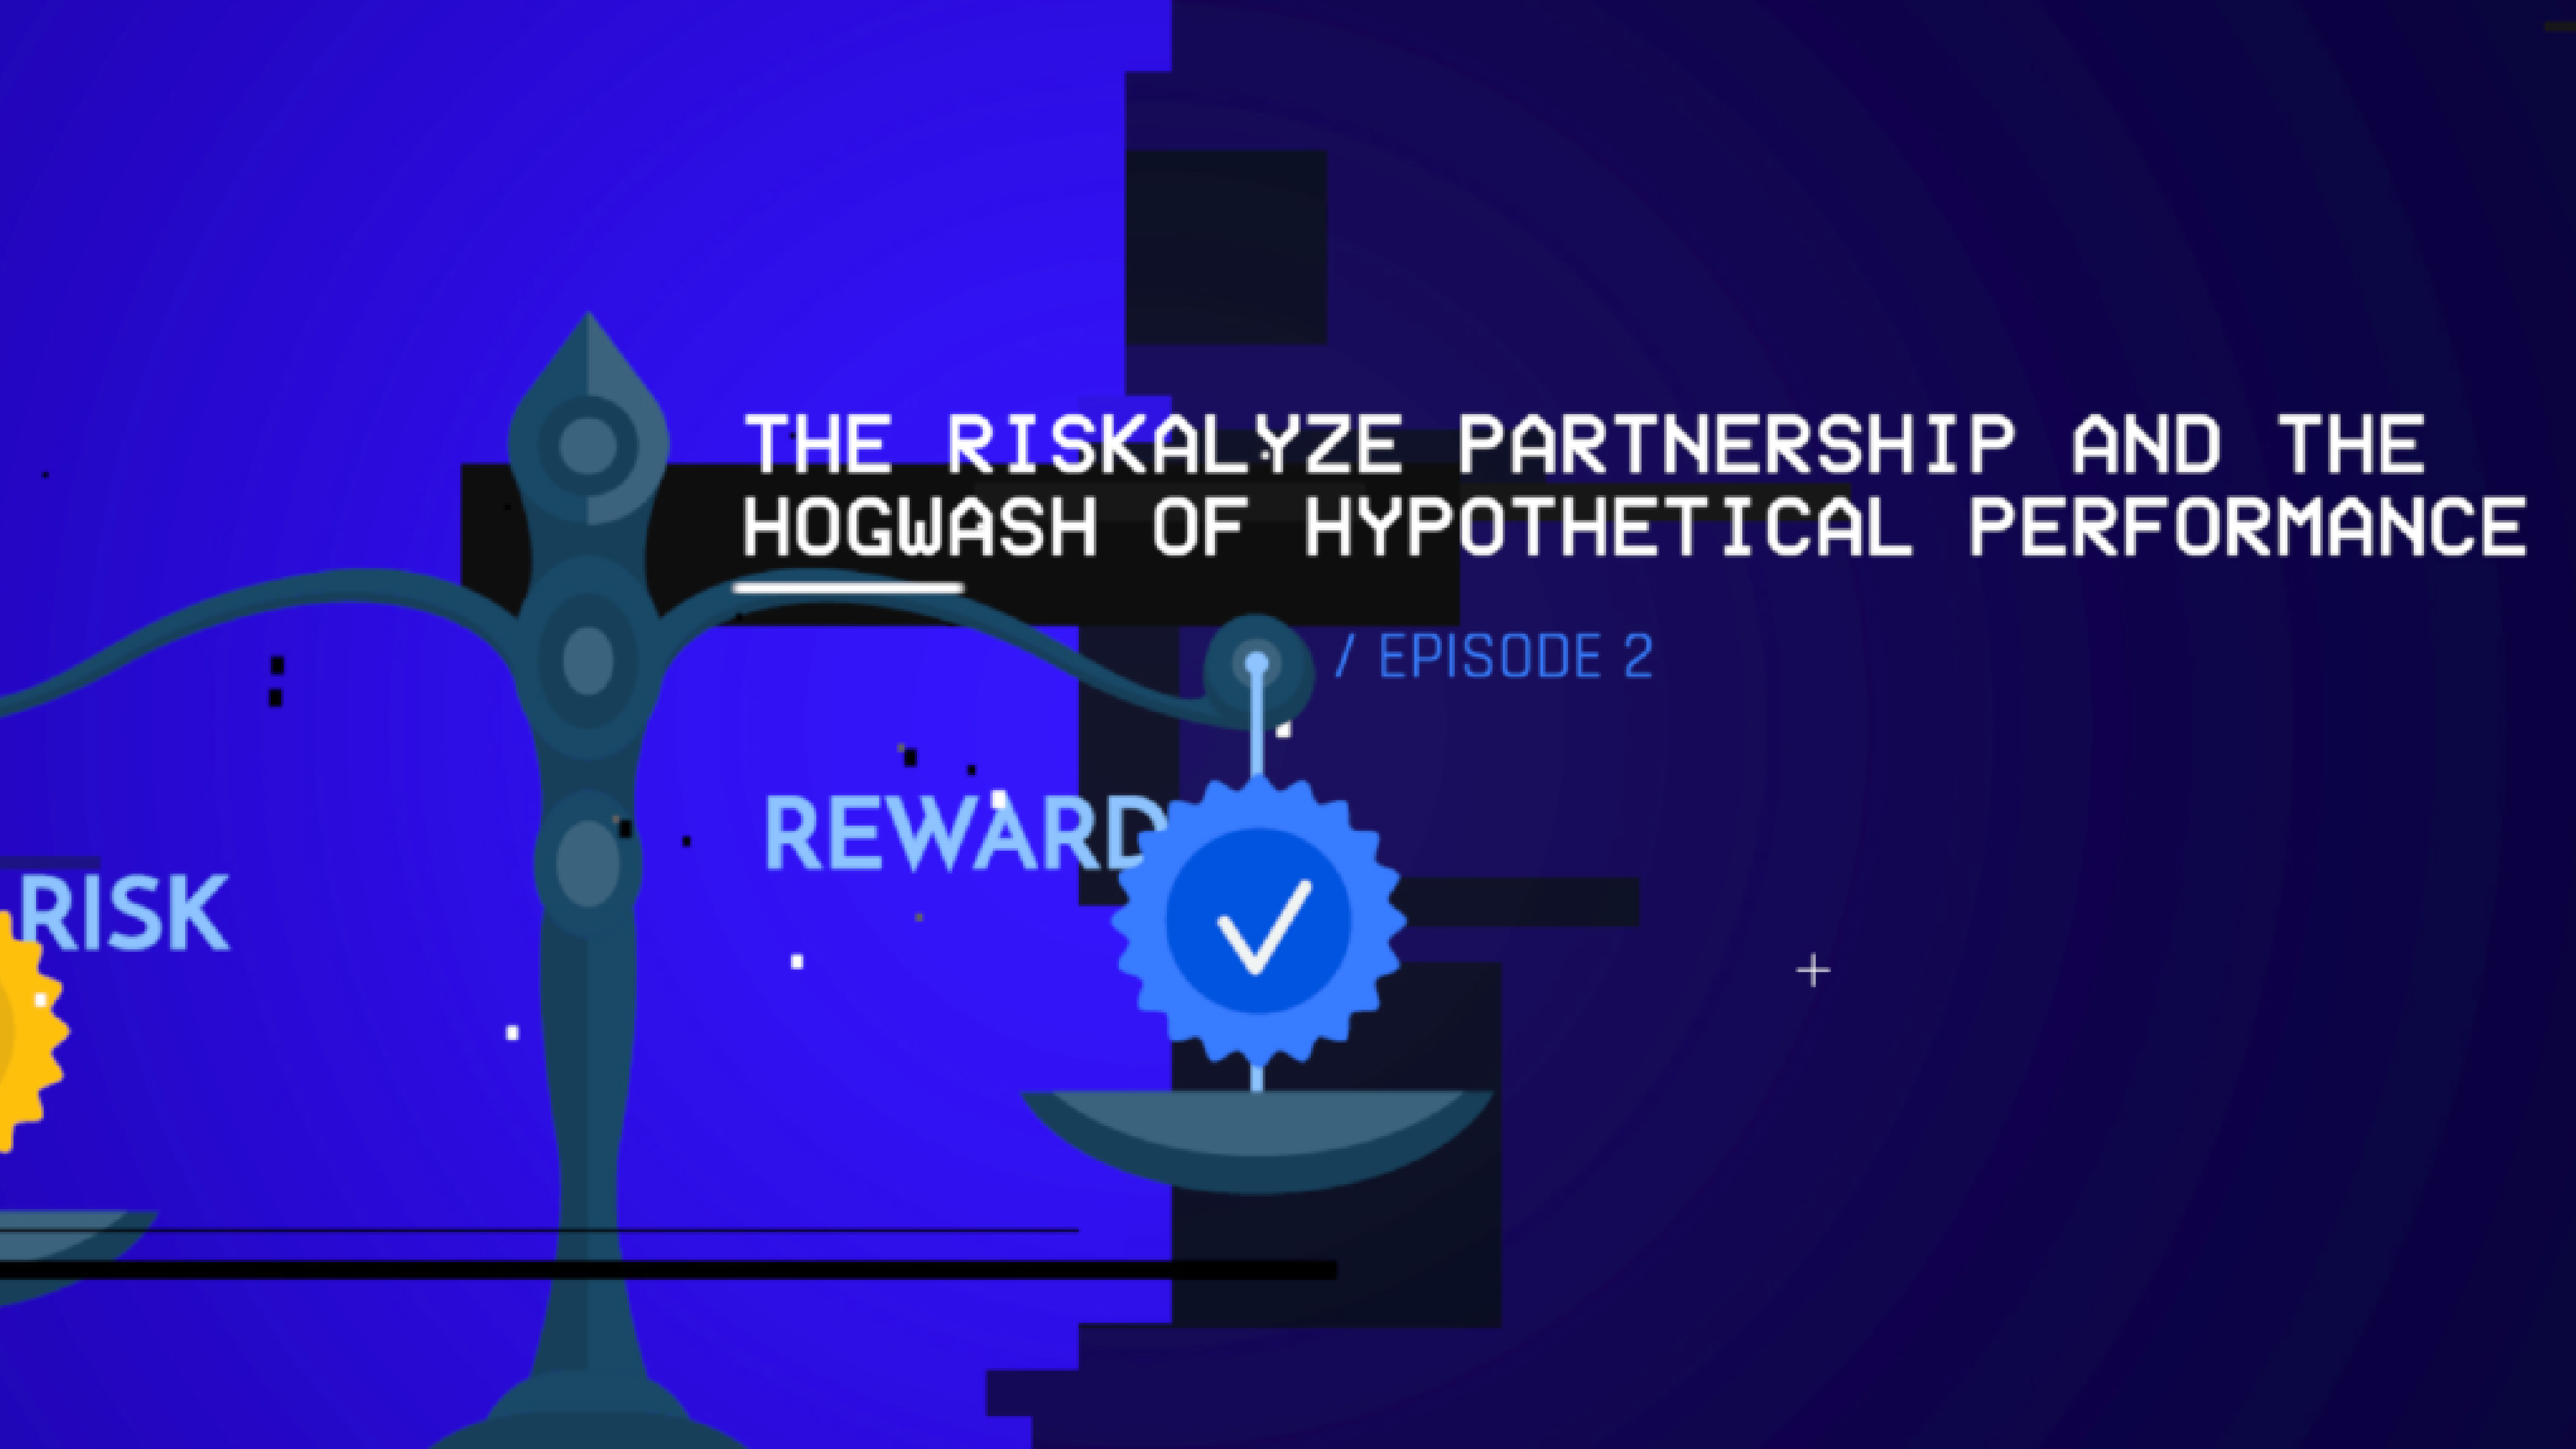 The Riskalyze Partnership and the Hogwash of Hypothetical Performance (S1 E2)